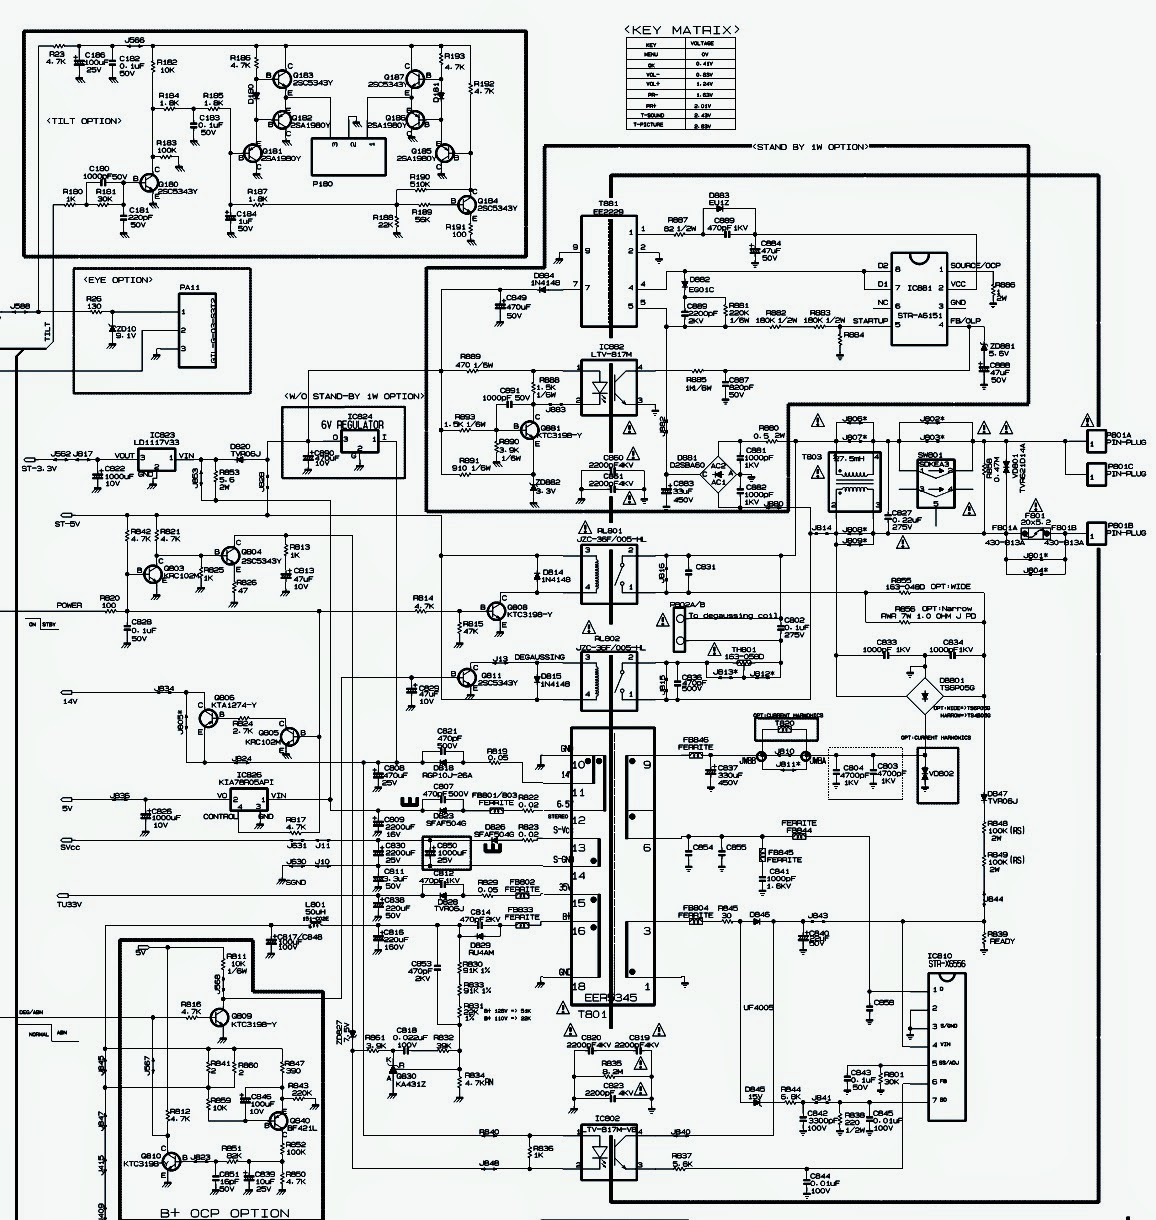 sony tv g14 diagram